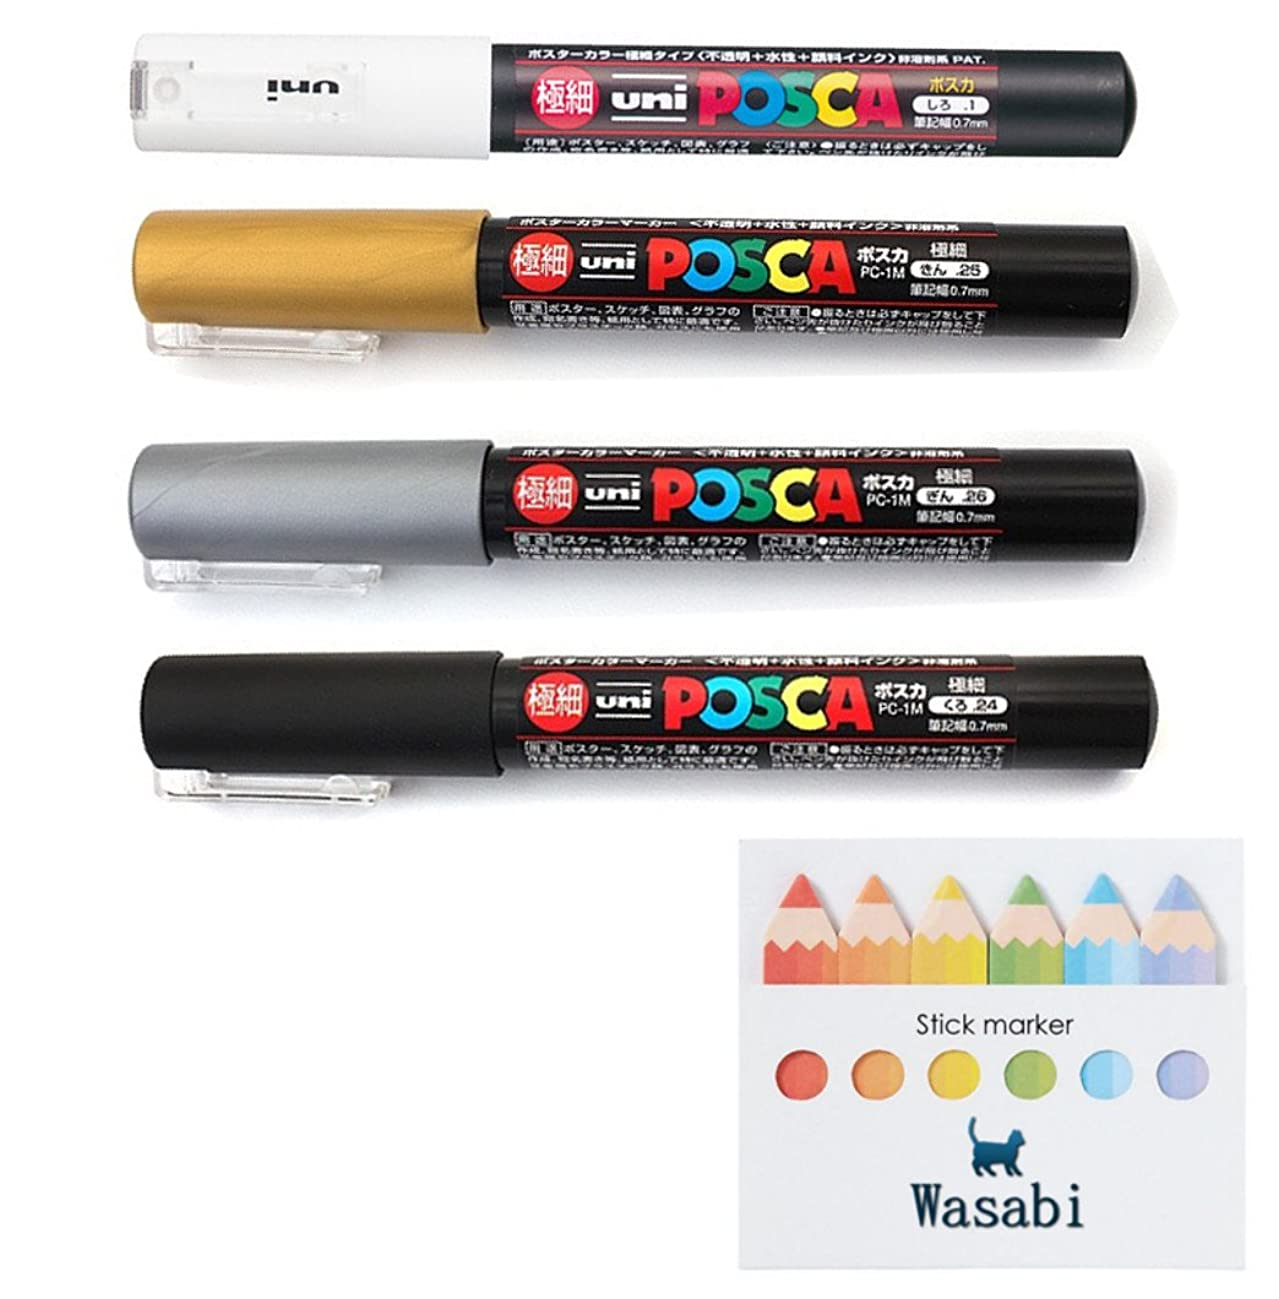 uni Posca Paint Marker Extra Fine (0.7mm) SPECIAL SET!! - WHITE/GOLD/SILVER/BLACK, Wasabi Sticky note